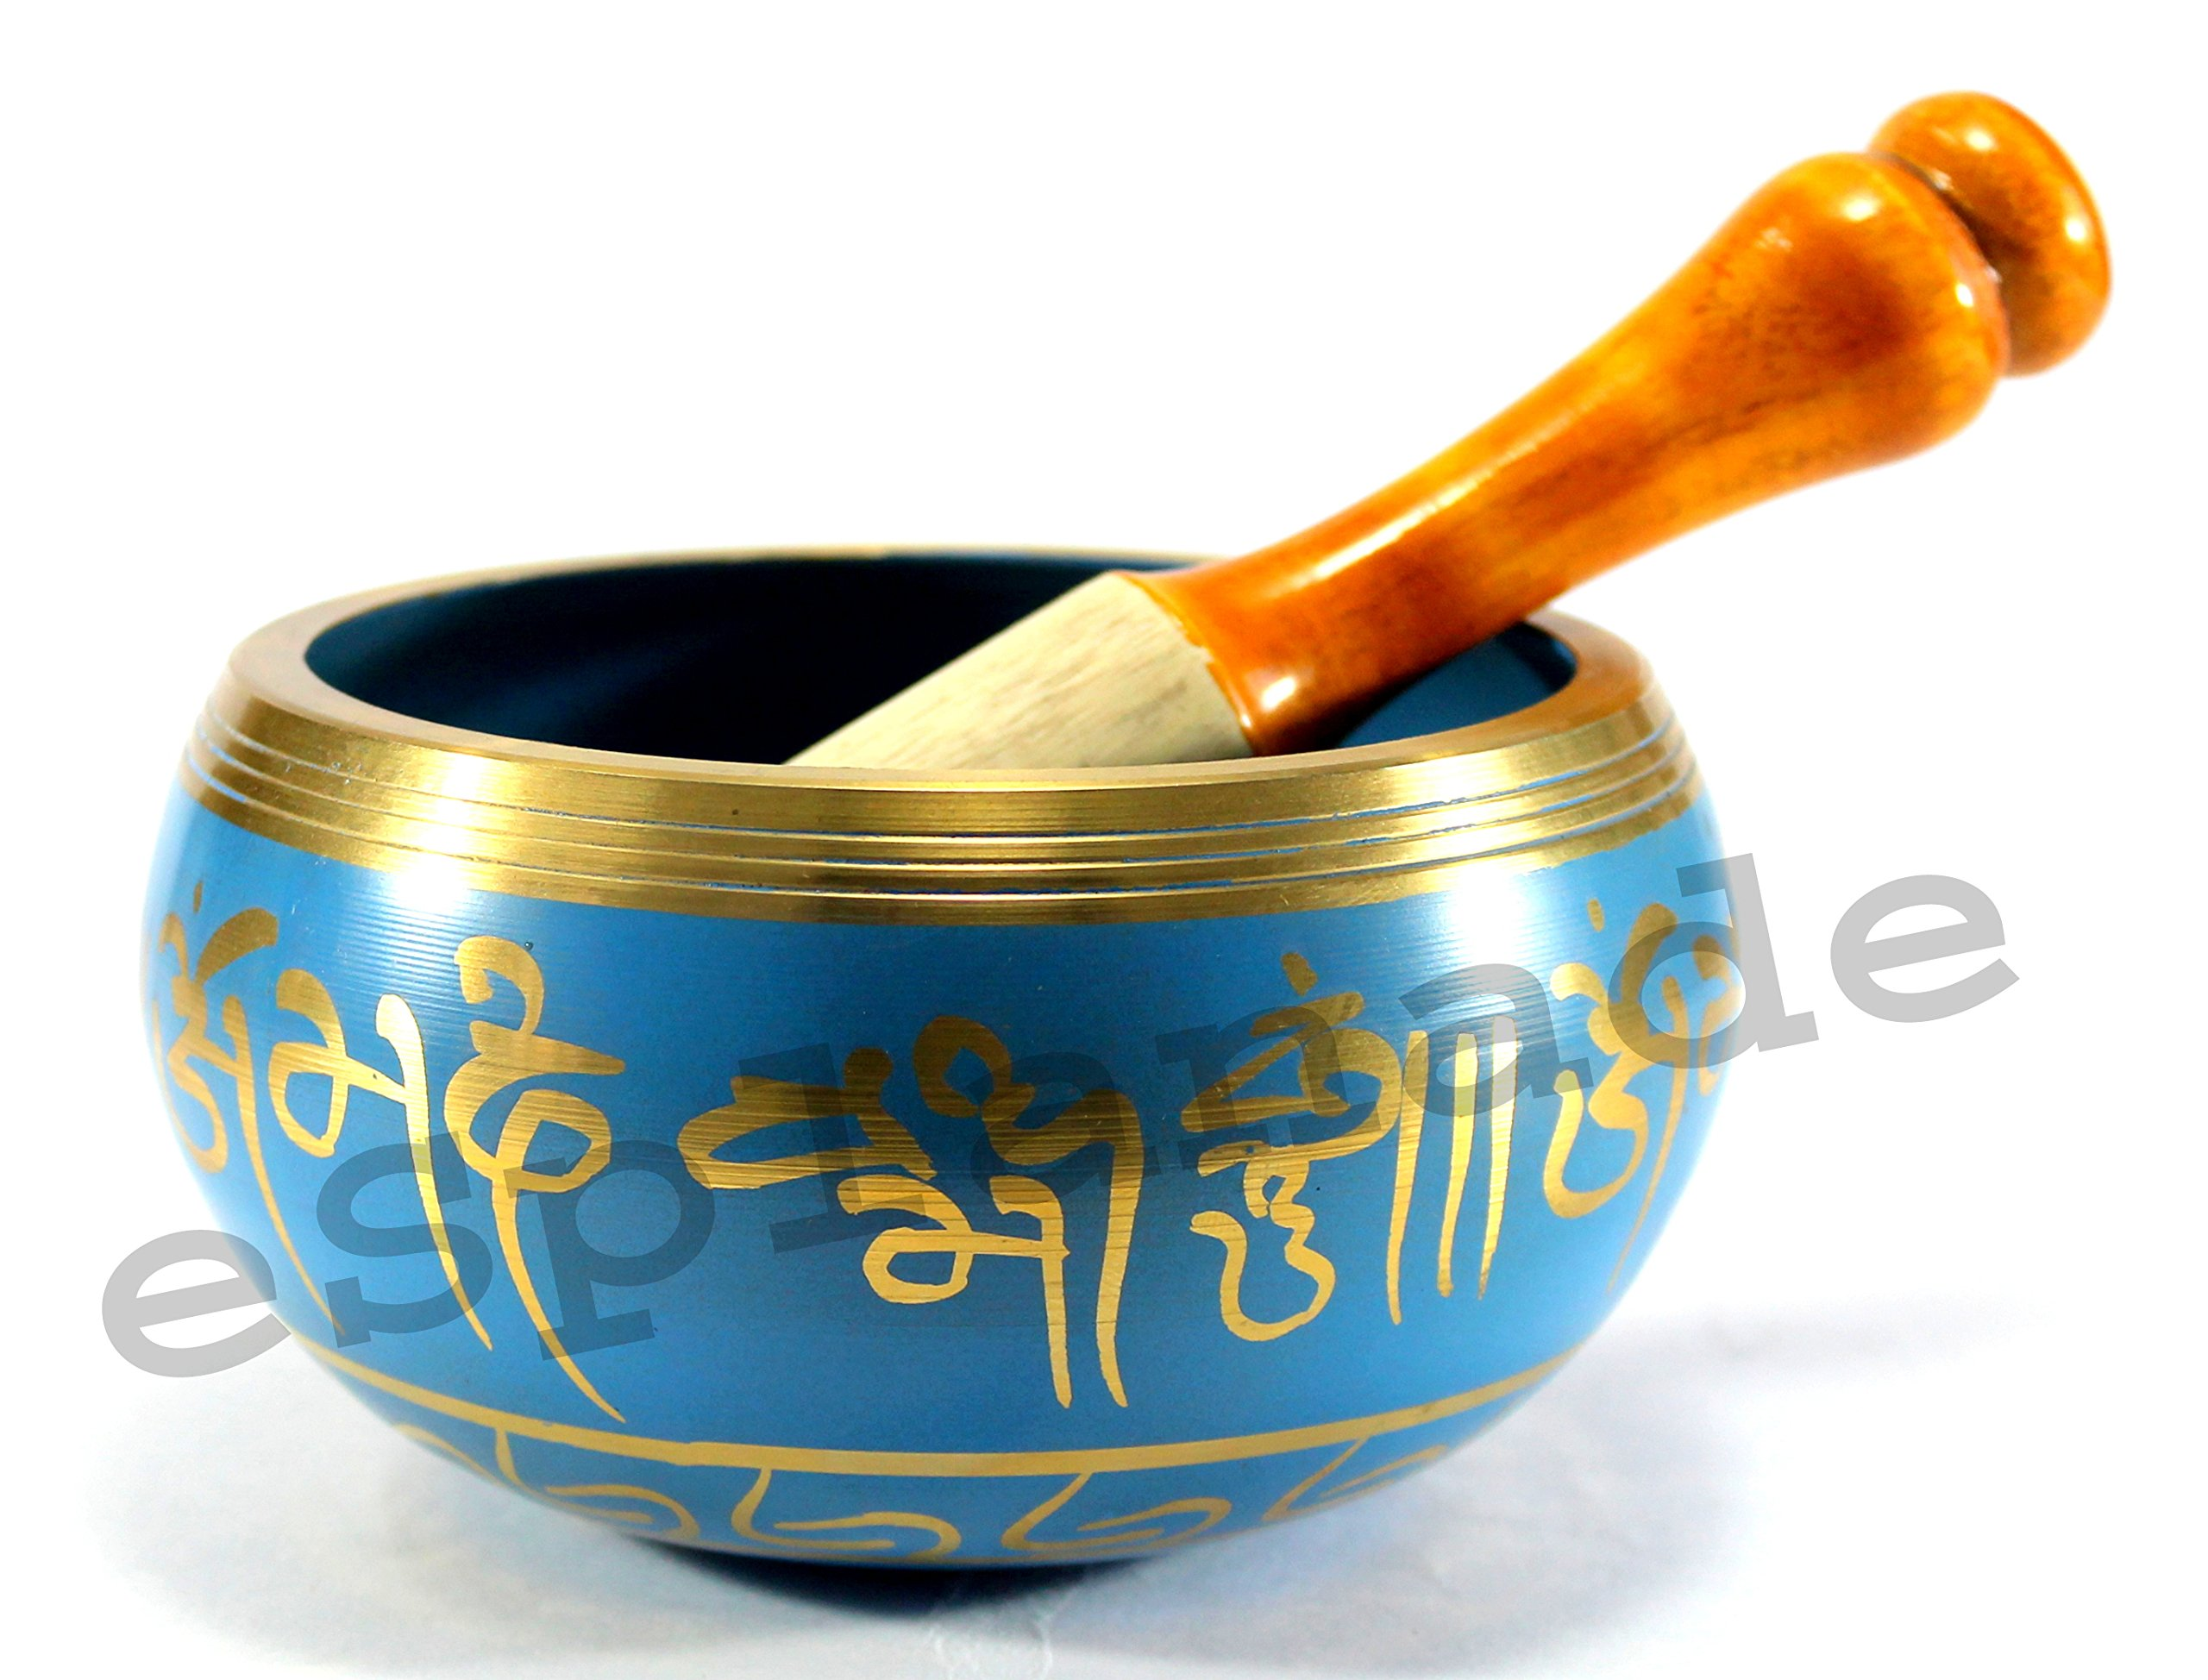 eSplanade - 5 inches - Singing Bowl Tibetan Buddhist Prayer Instrument With Striker Stick | OM Bell | OM Bowl | Meditation Bowl | Music Therapy